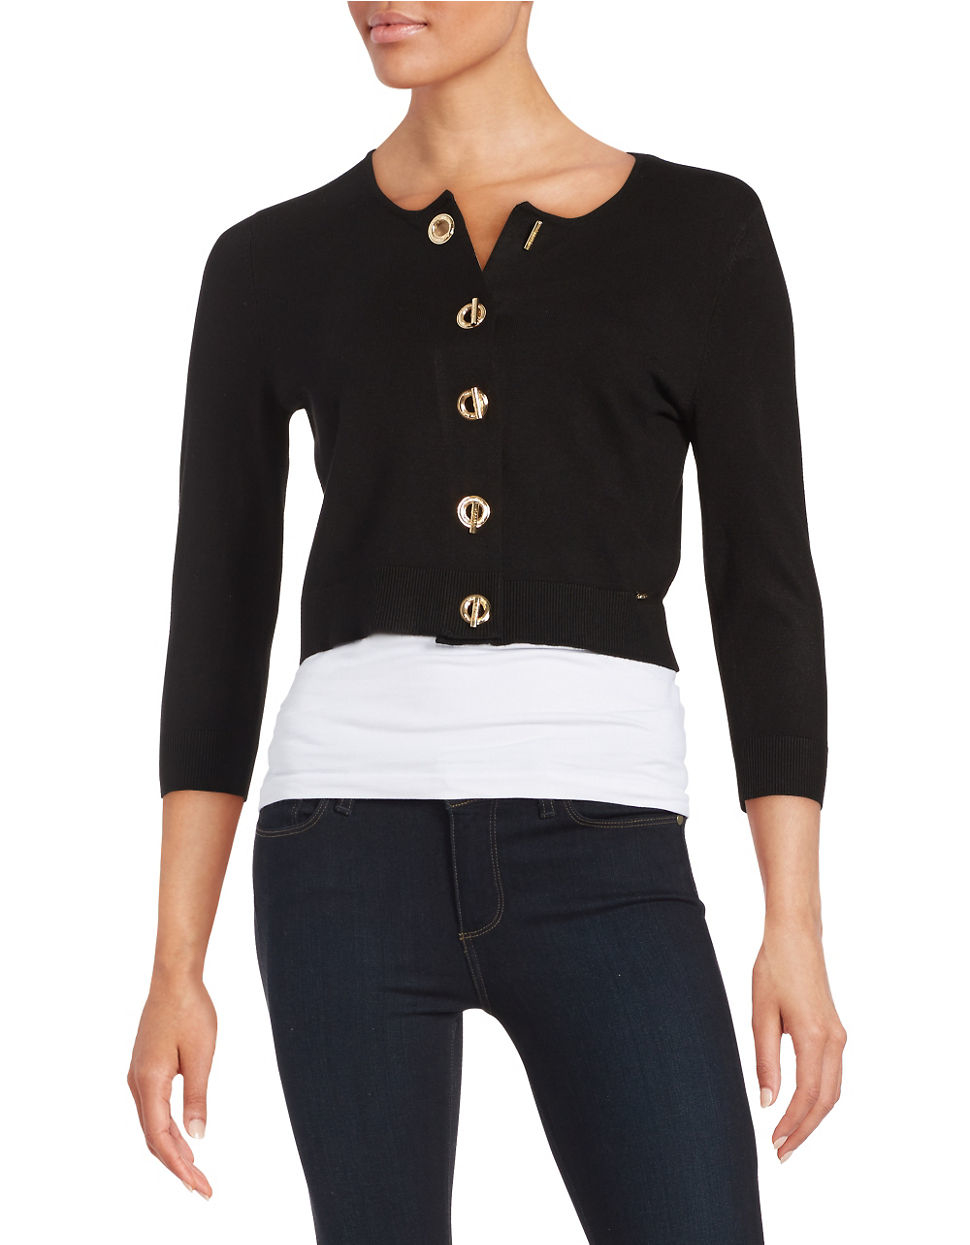 calvin klein knit toggle cardigan in black lyst. Black Bedroom Furniture Sets. Home Design Ideas